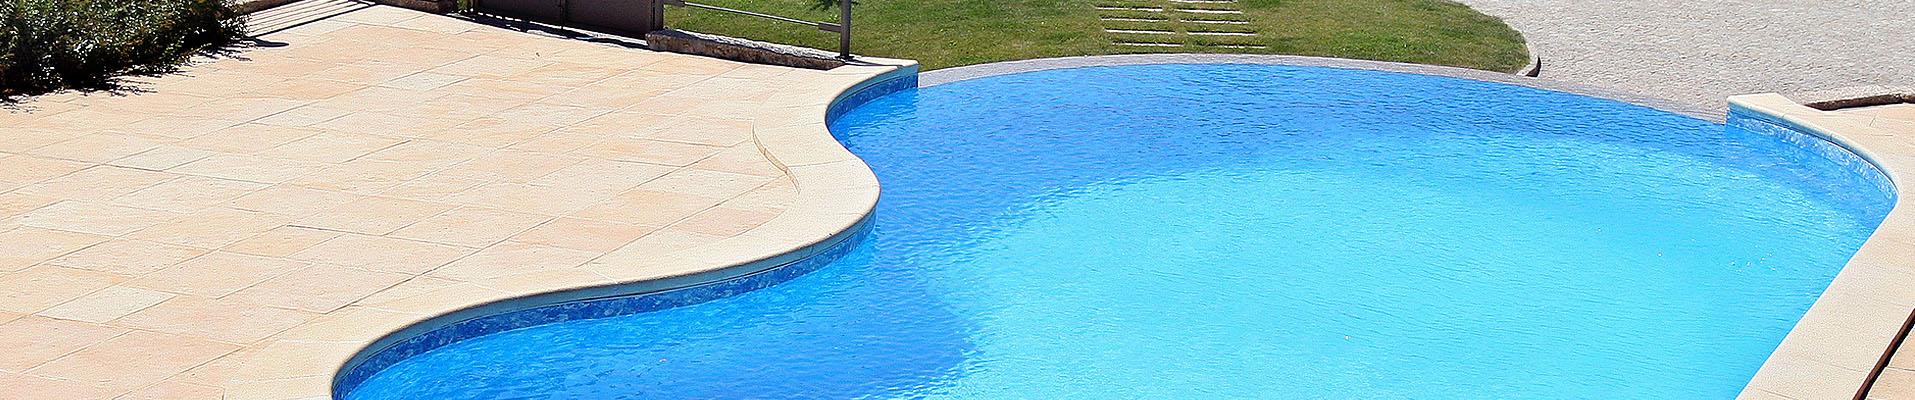 tratamento_de-piscinas_01